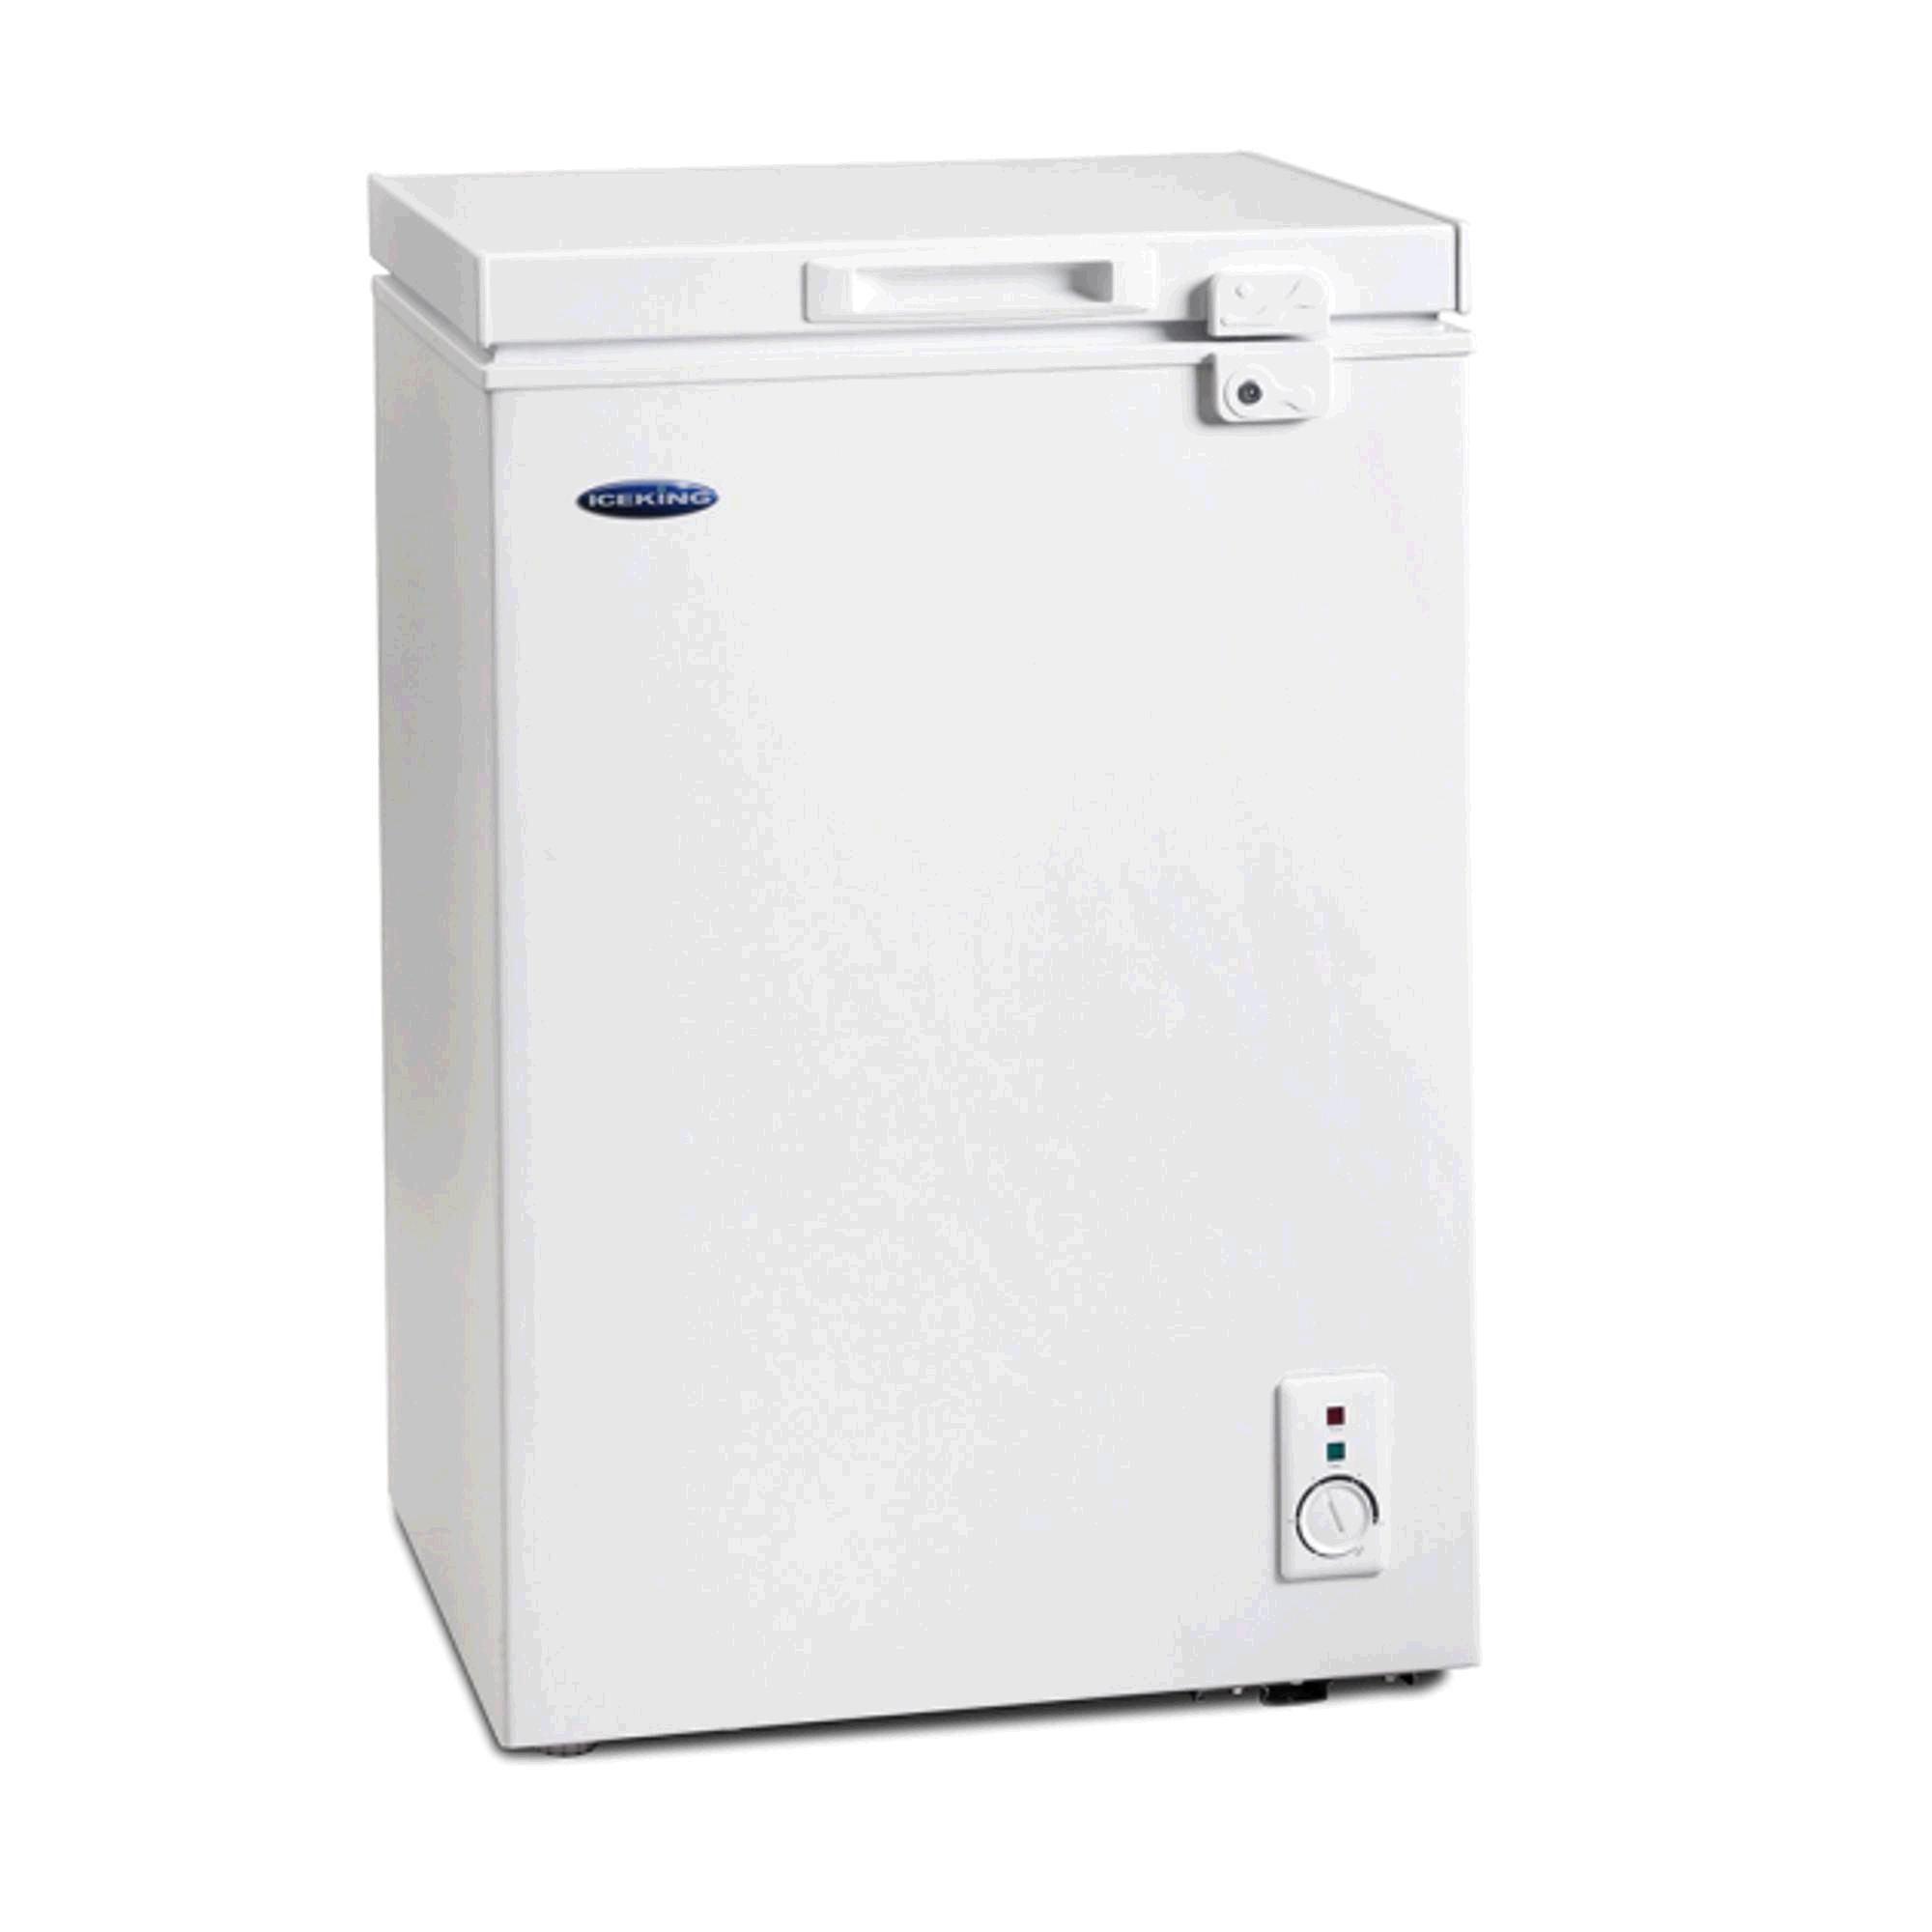 ICEKING 98L Chest Freezer WHITE